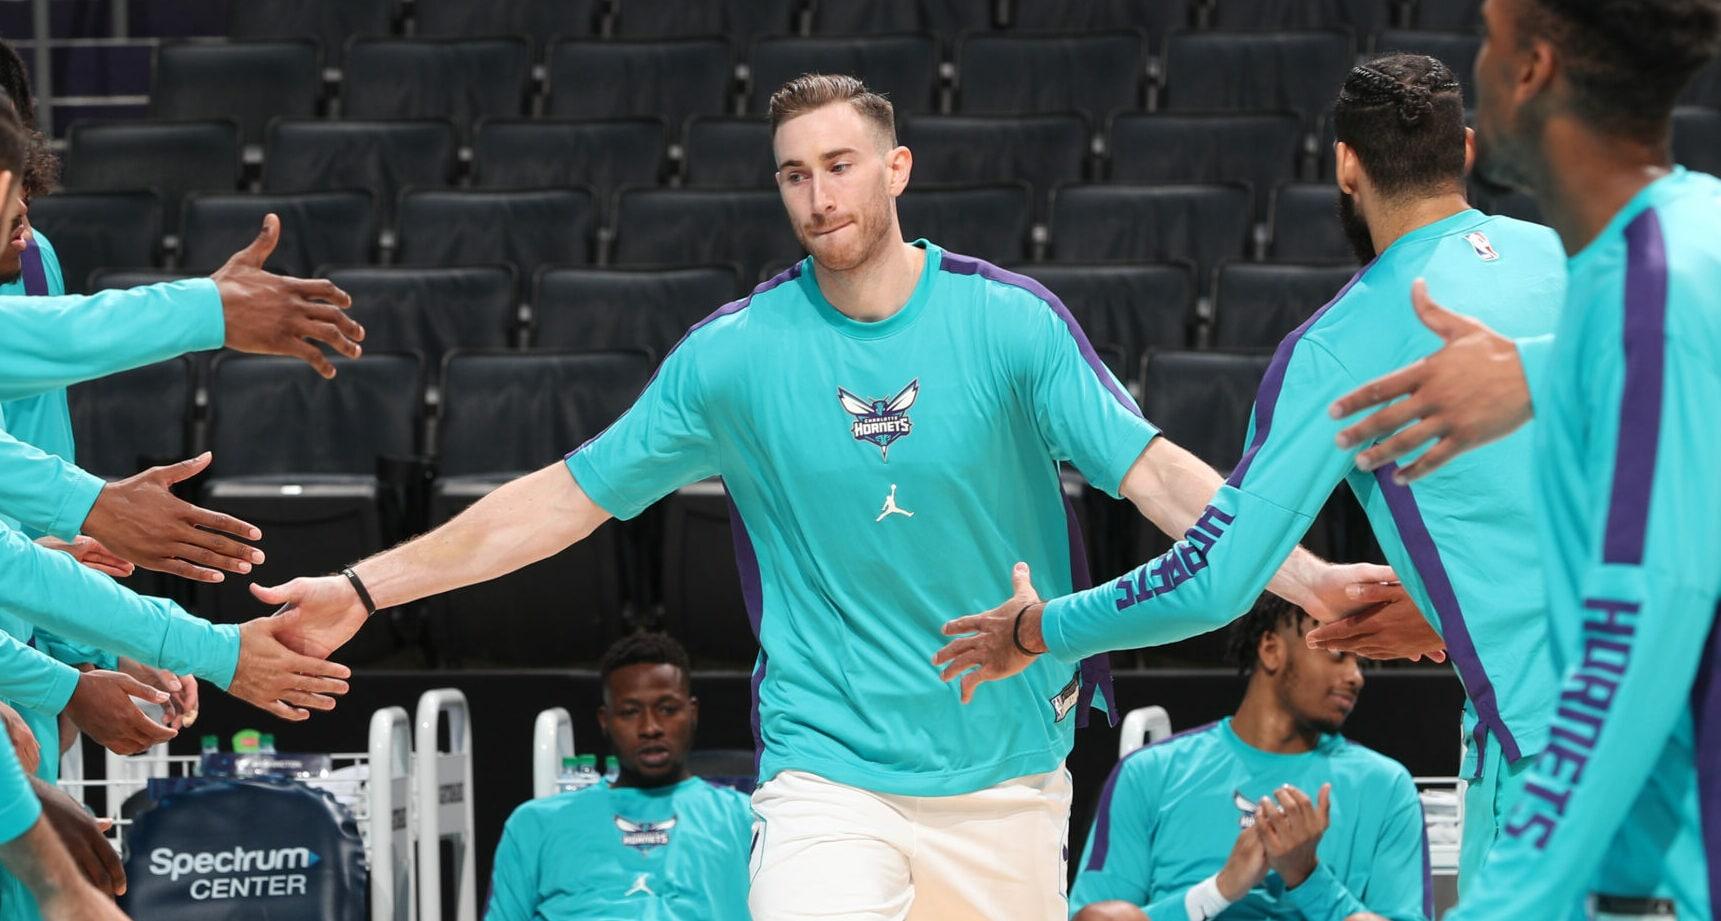 Gordon Hayward available to play in Hornets' season opener